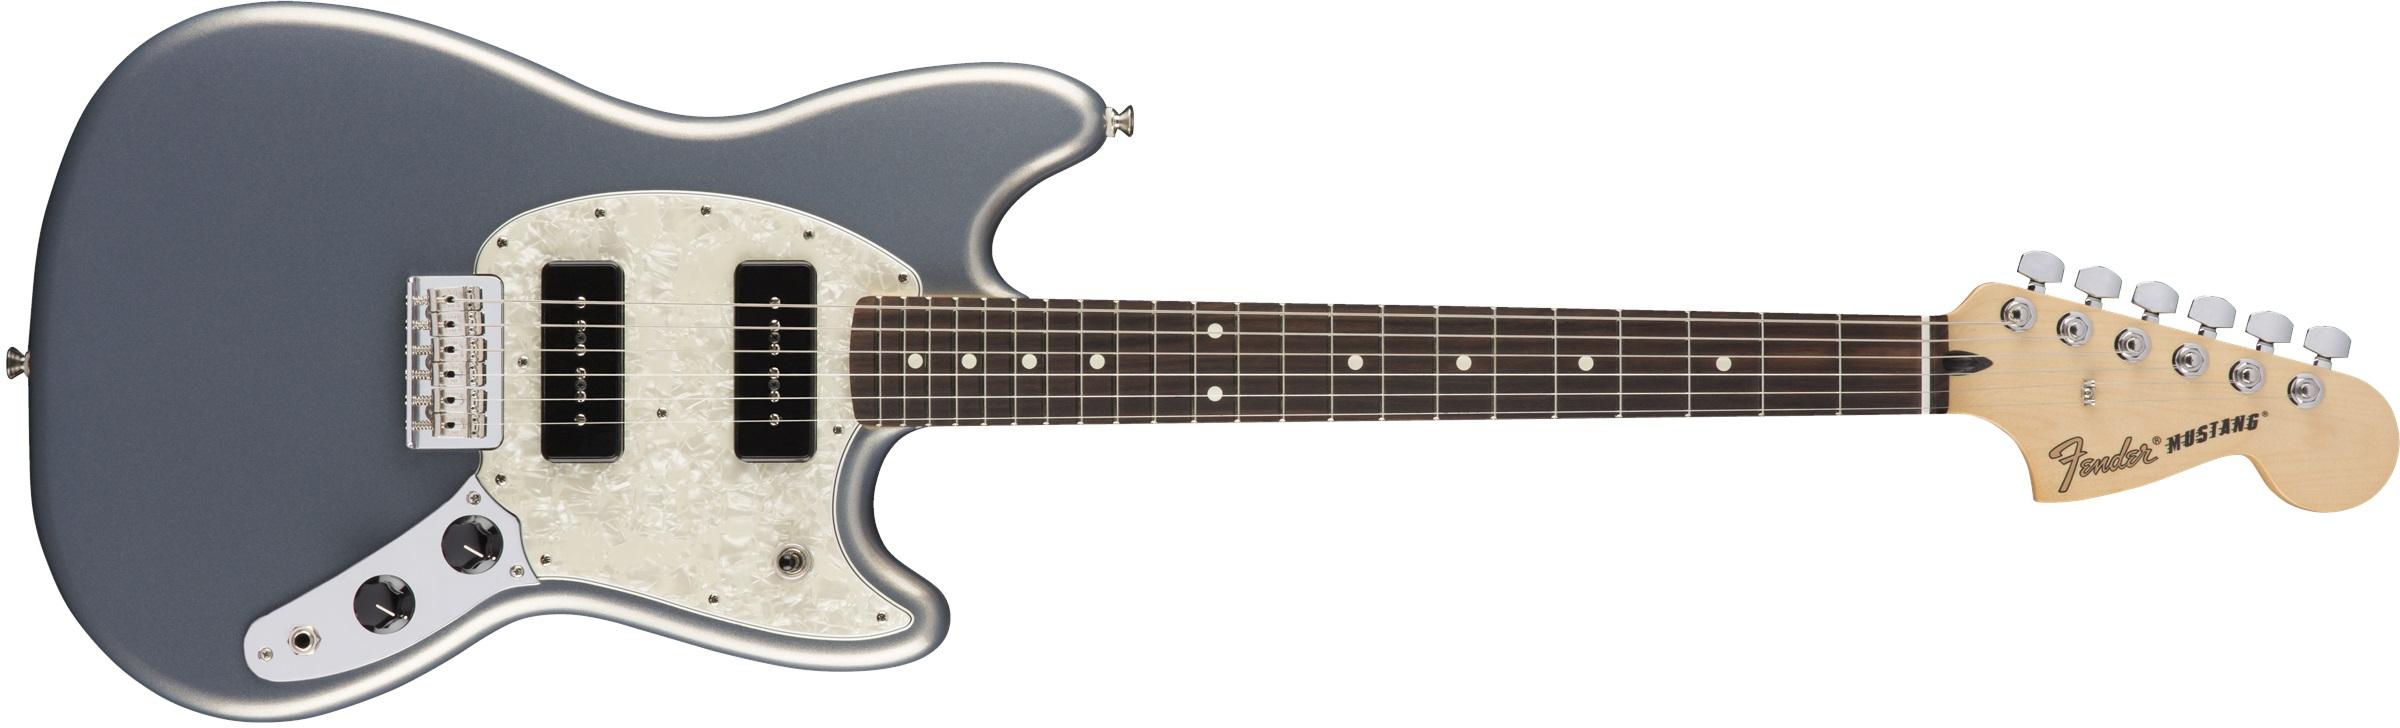 Fender Mustang P90 RW SL